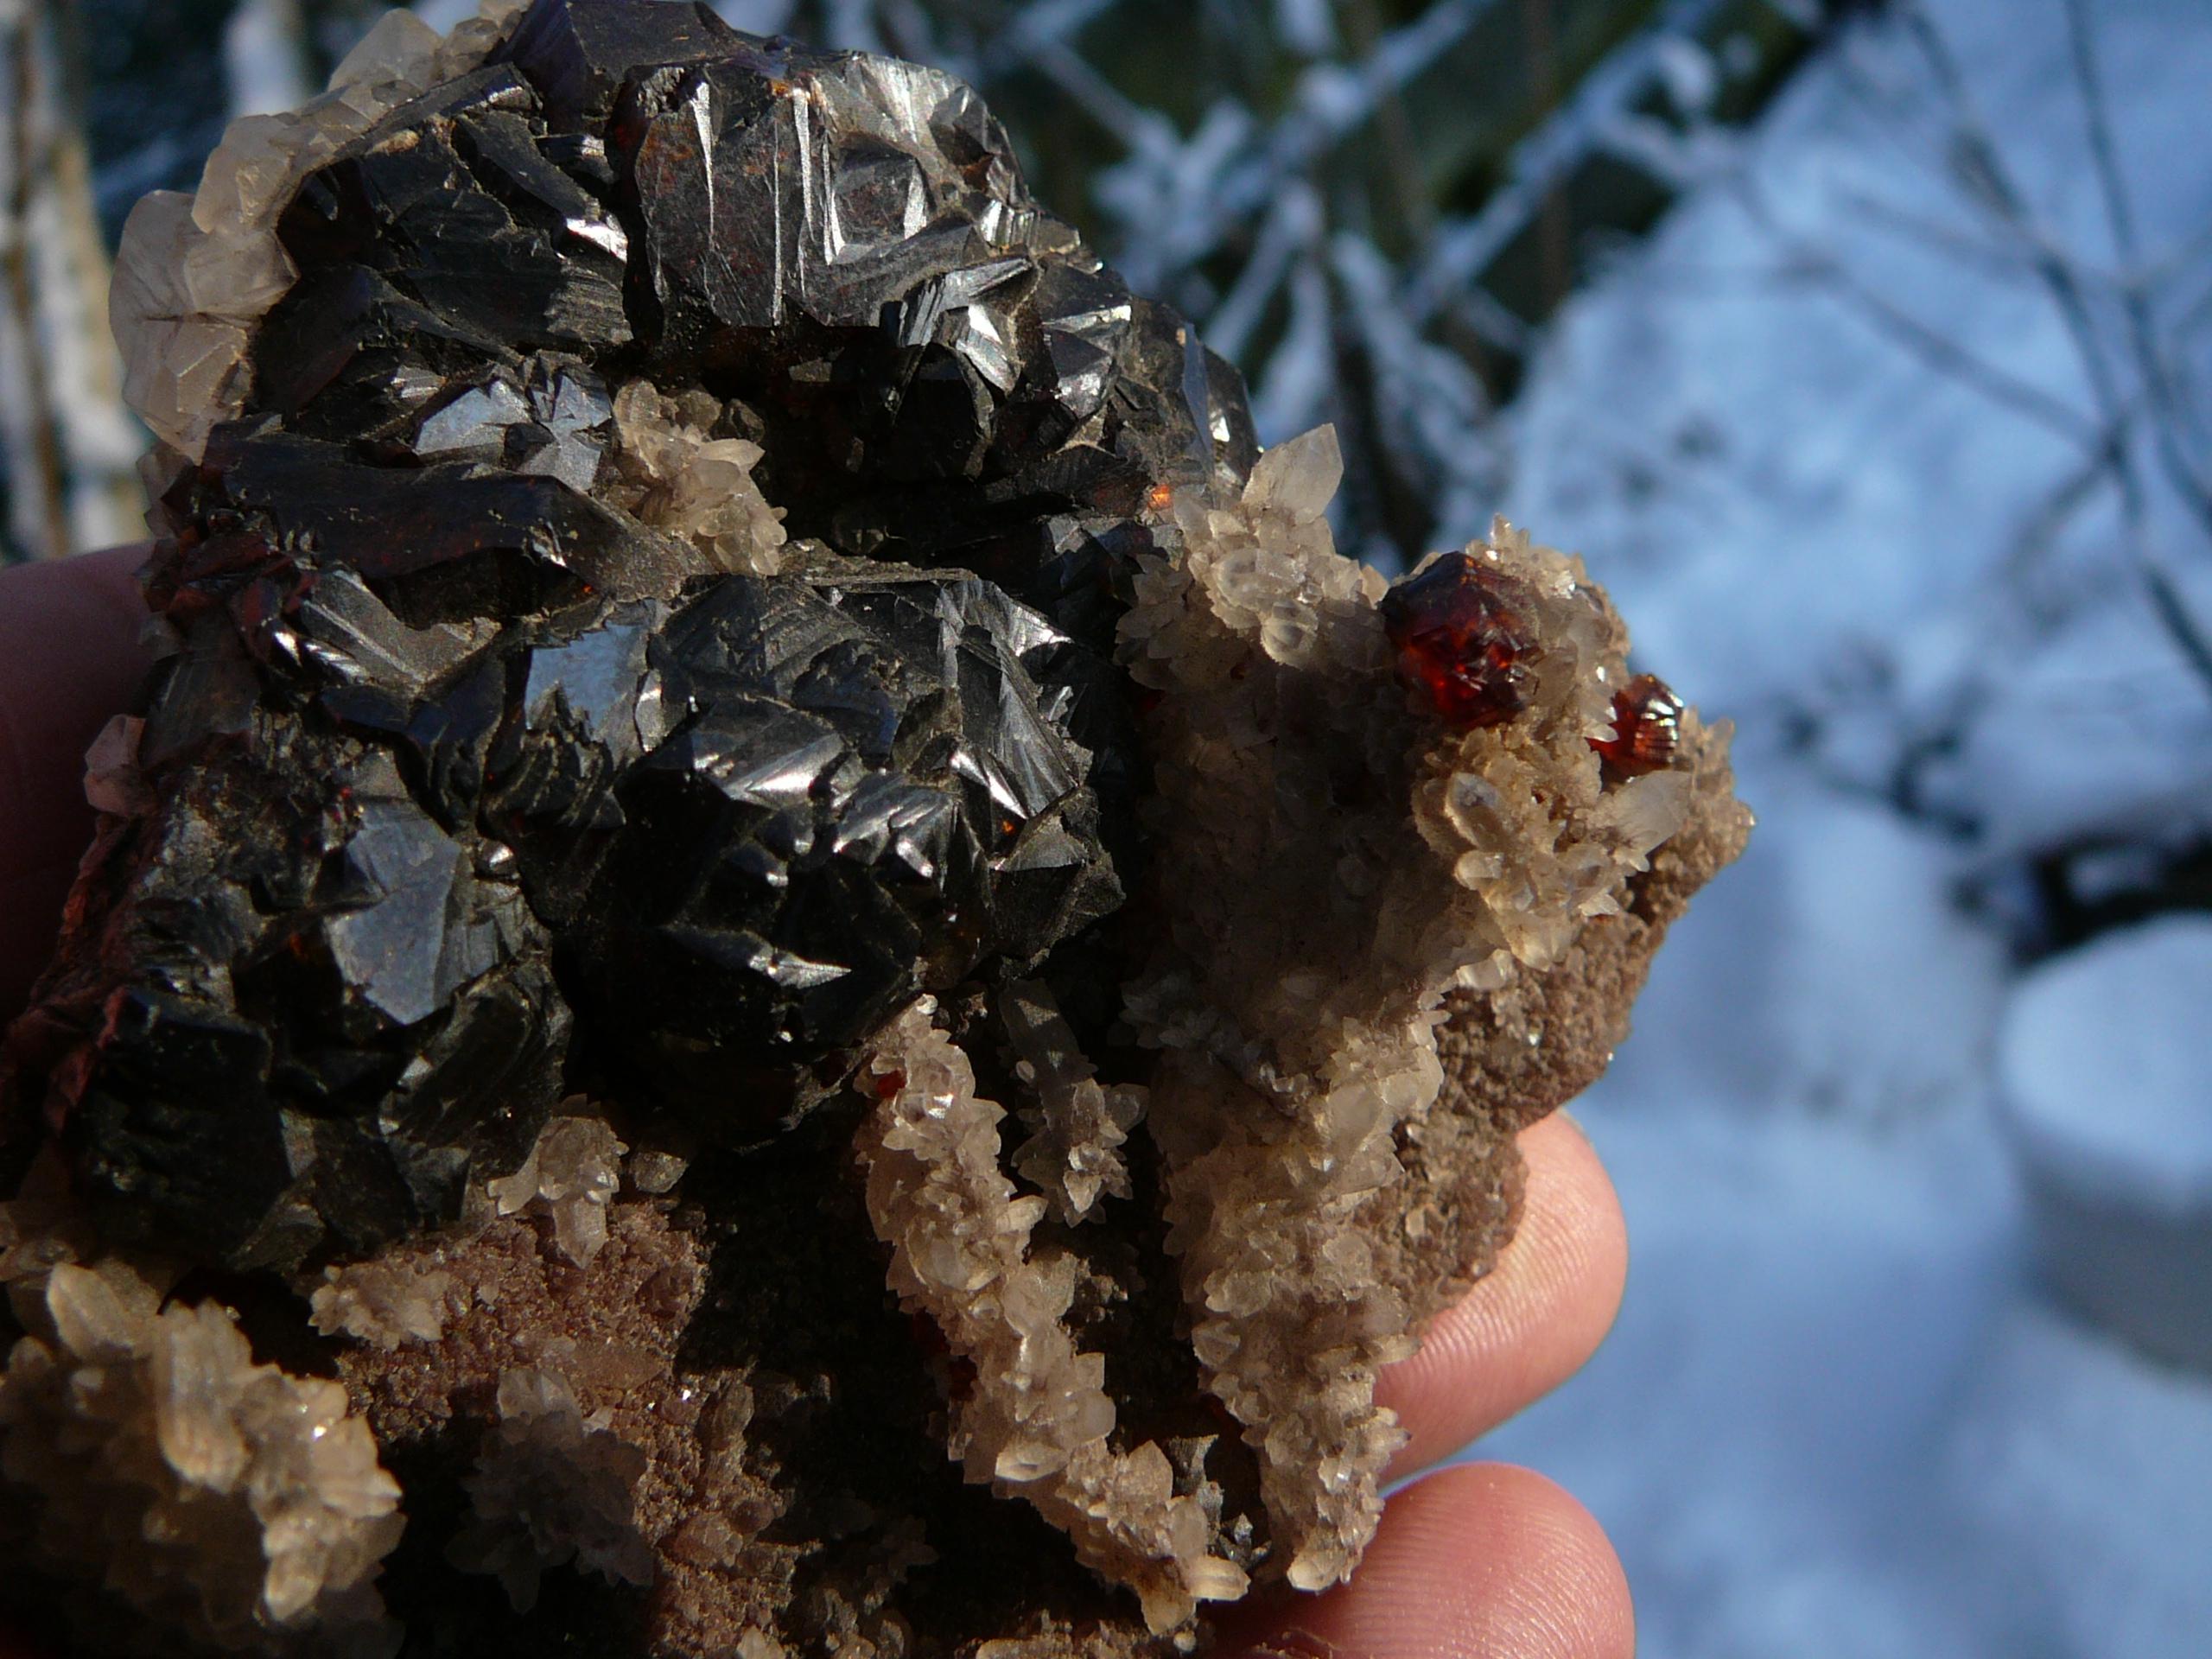 Honey to chocolate brown sphalerite crystals